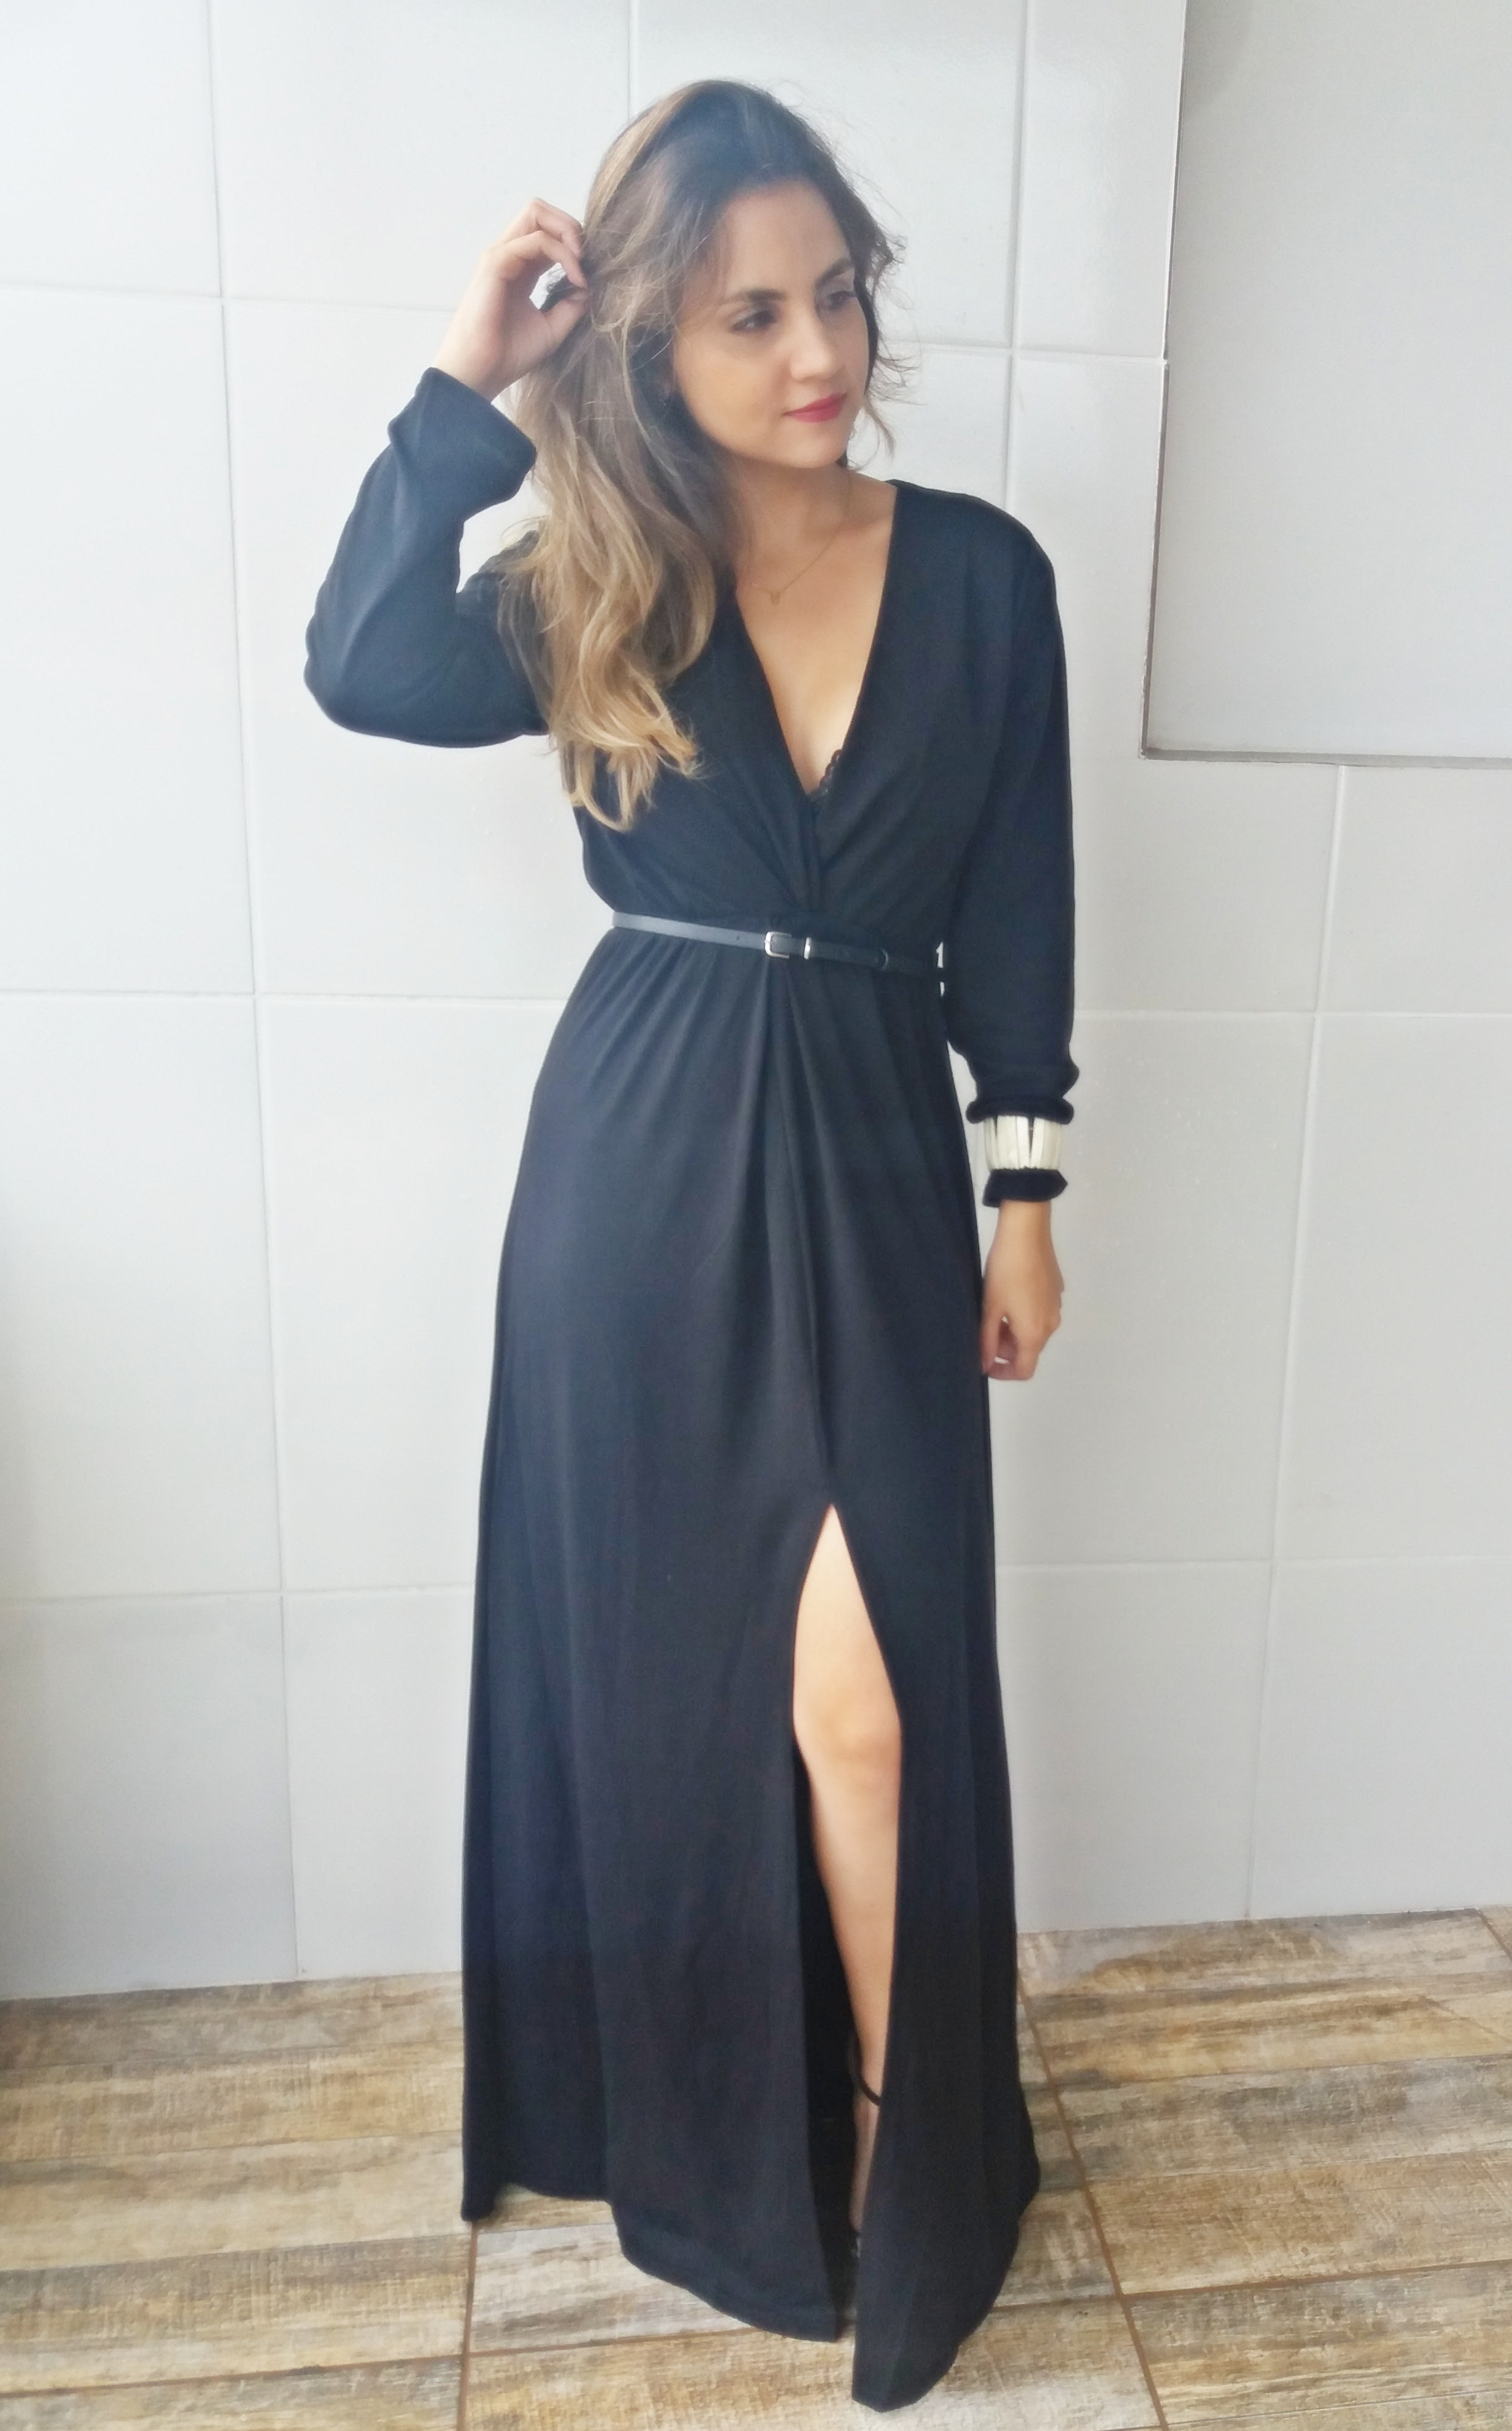 20170118_160429 Look da ka: Fatal Longo Black Dress